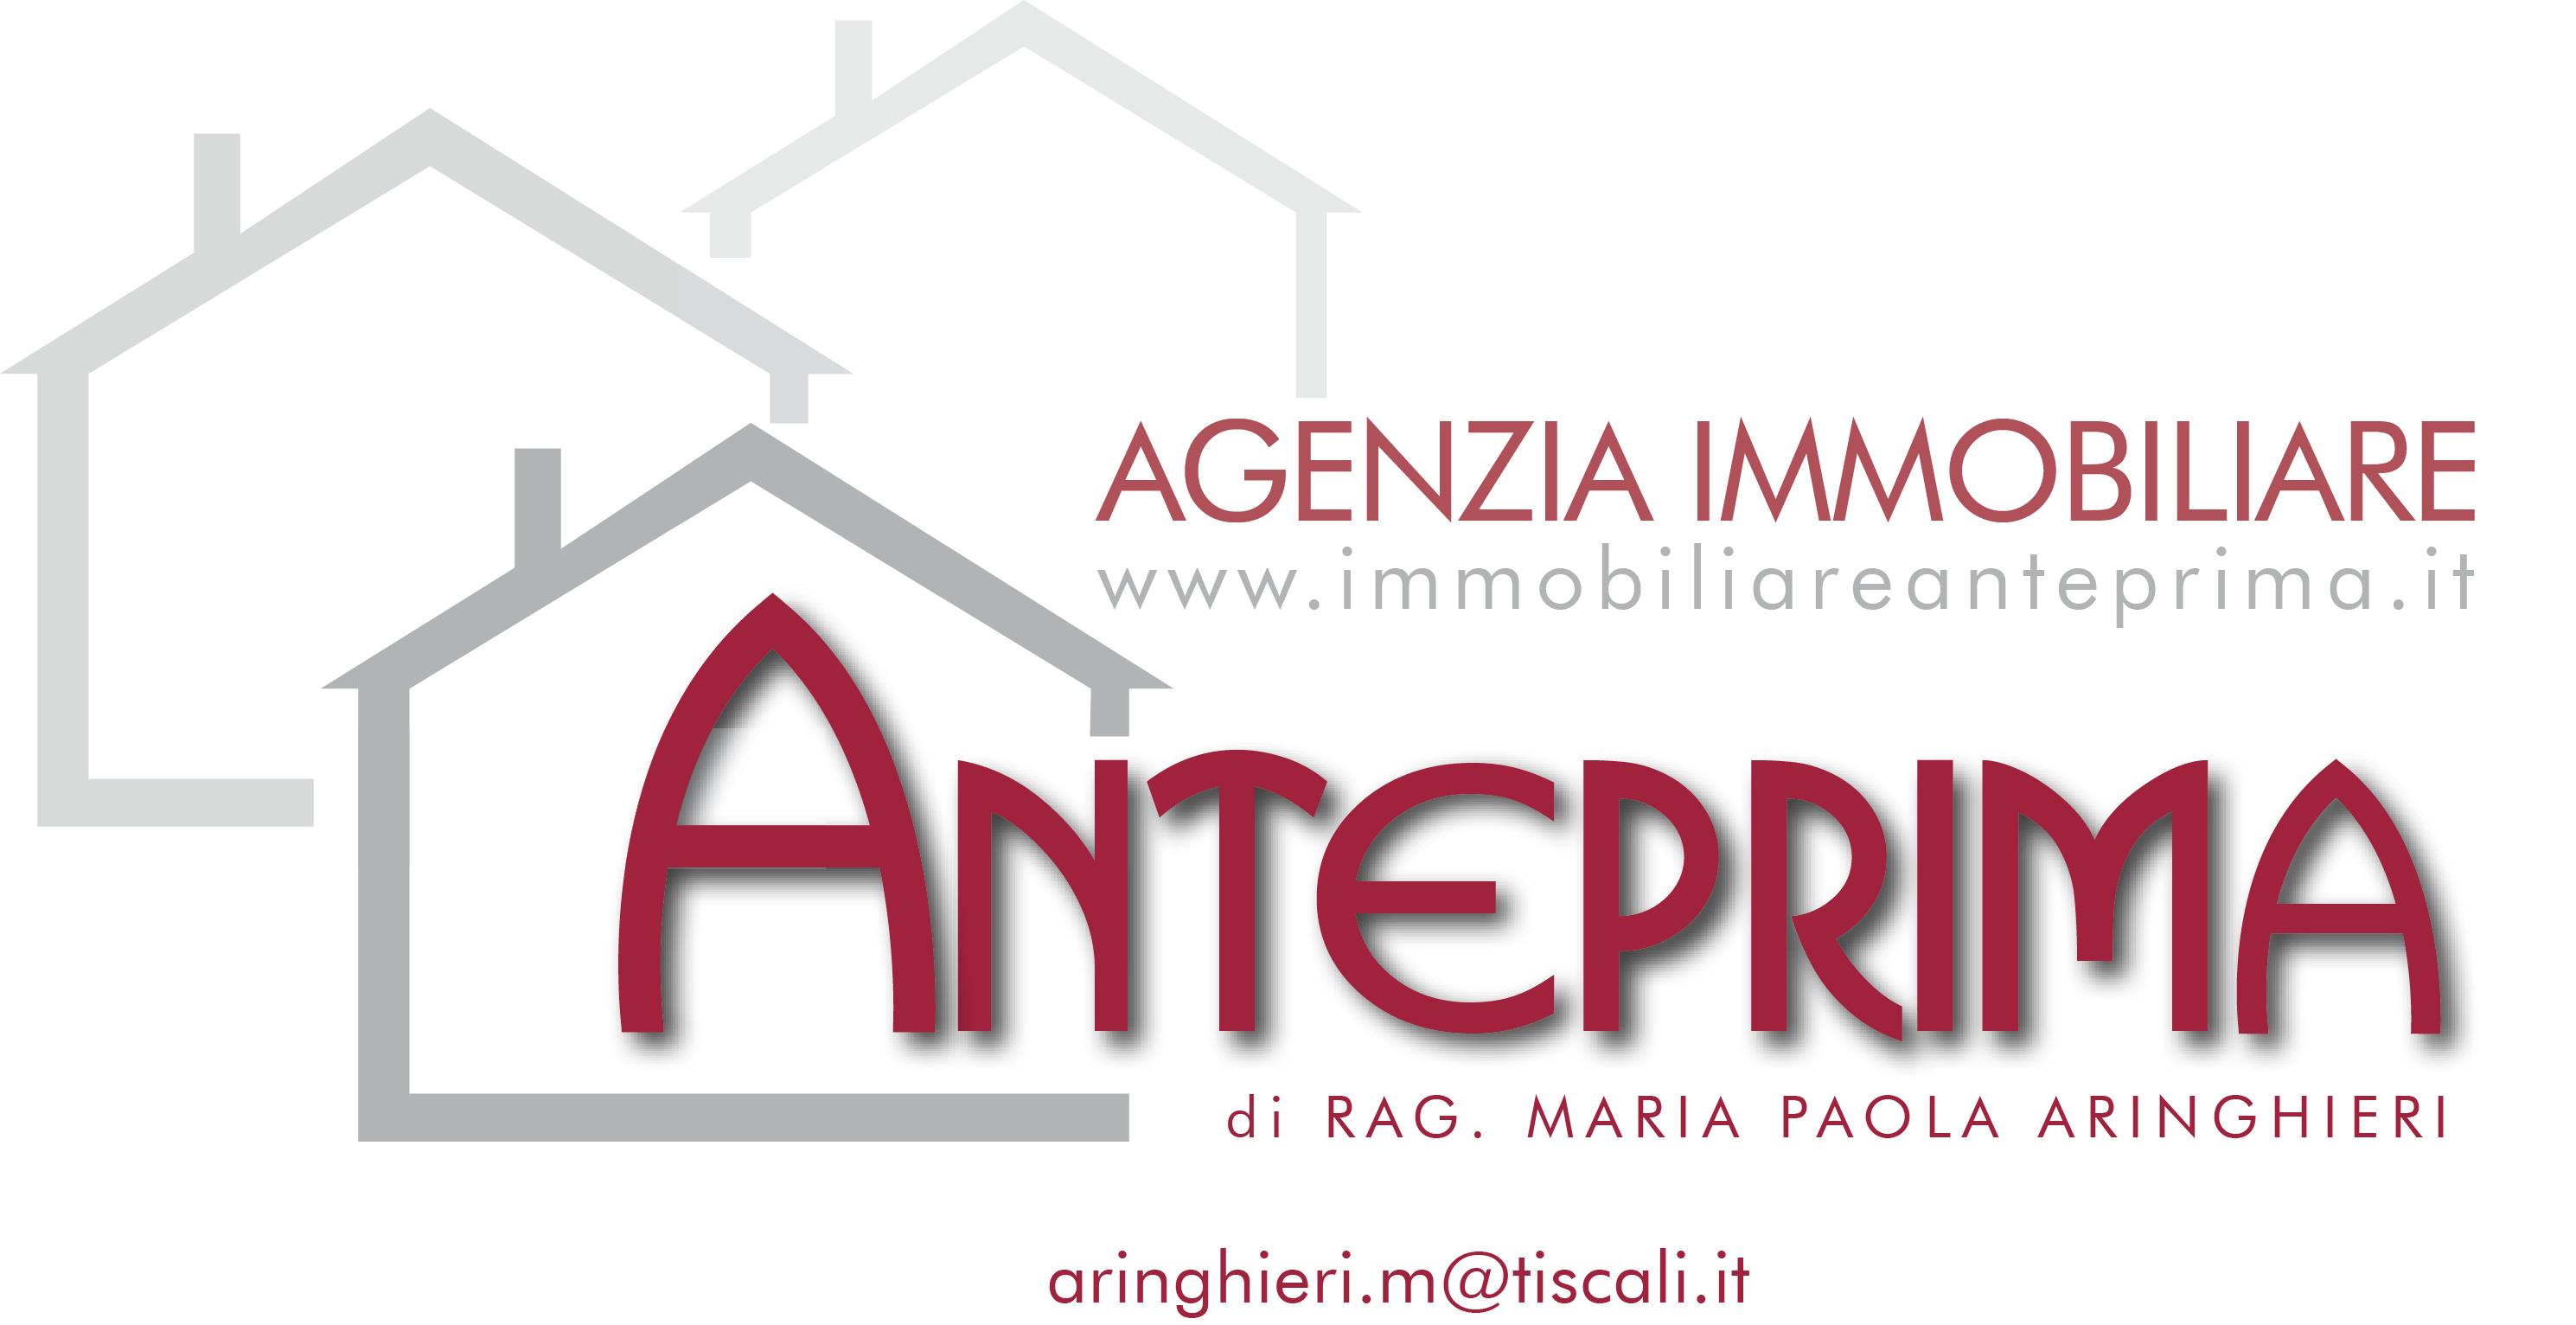 logo ANTEPRIMA IMMOBILIARE